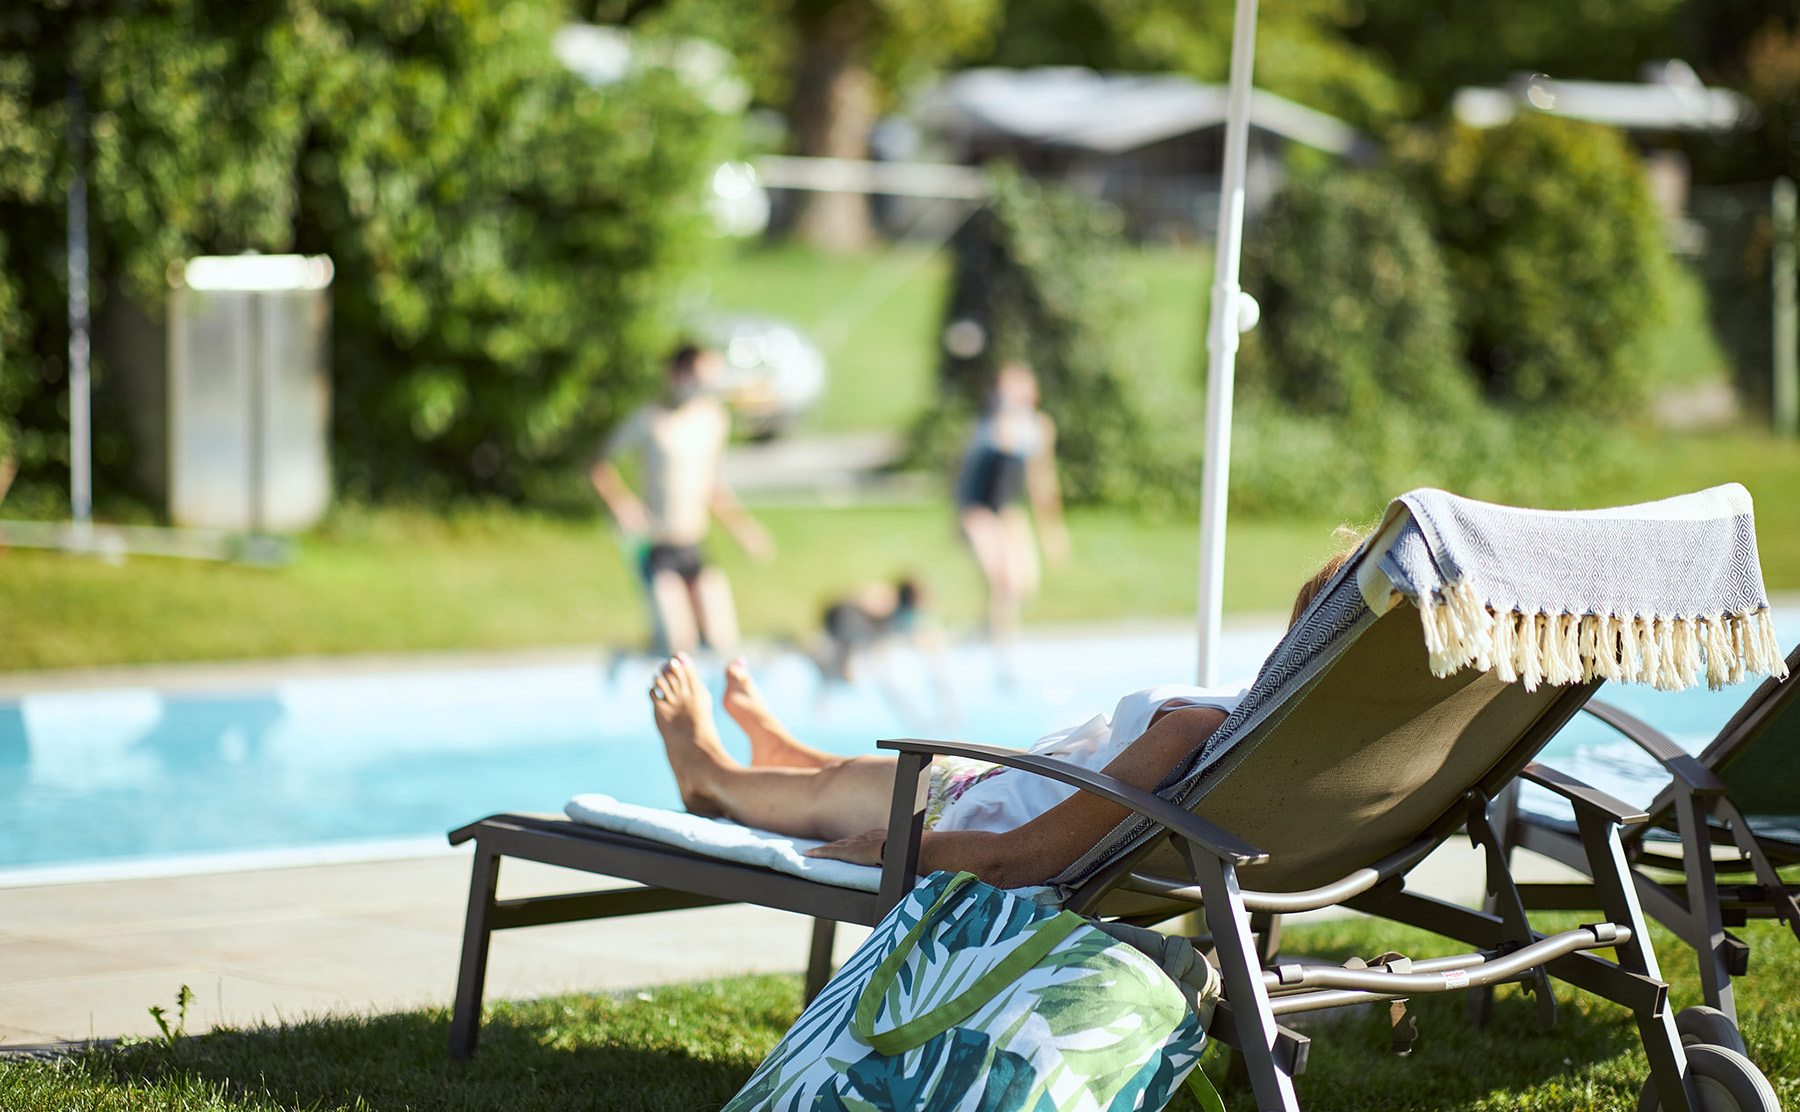 Schlosscamping Aschach Pool Schwimmbad